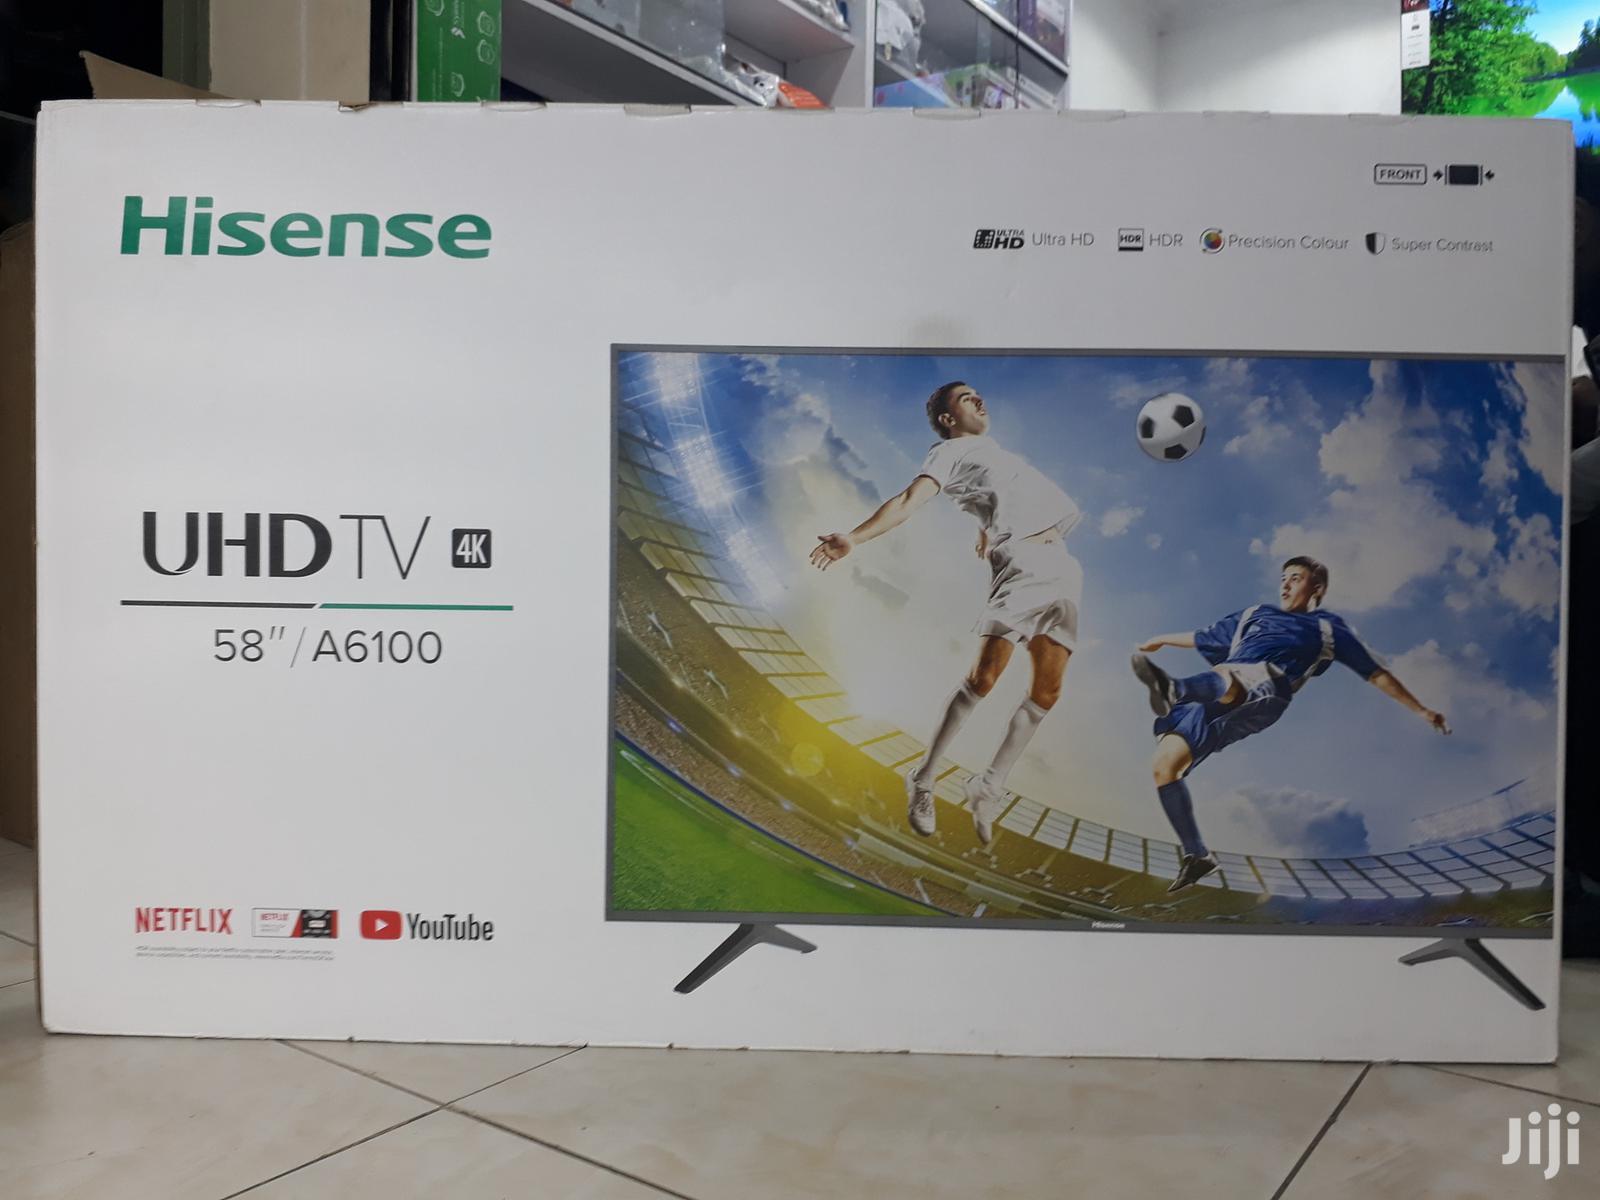 Hisense Smart 4K Uhd Tv 58 Inch